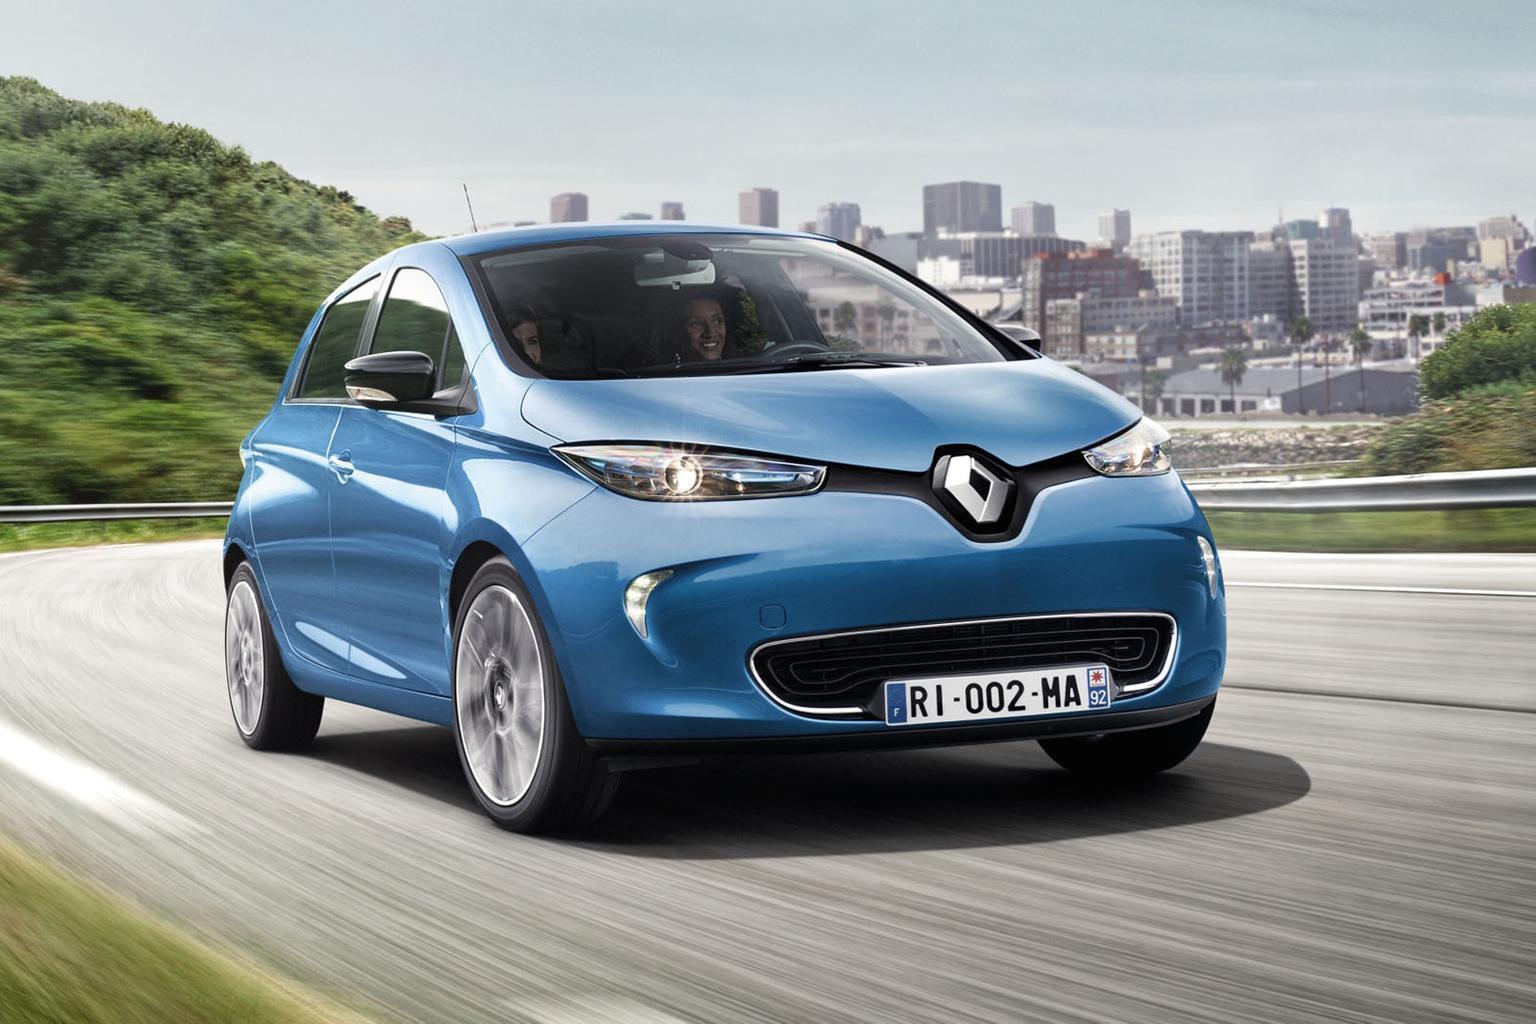 Upgraded Renault Zoe gets more range